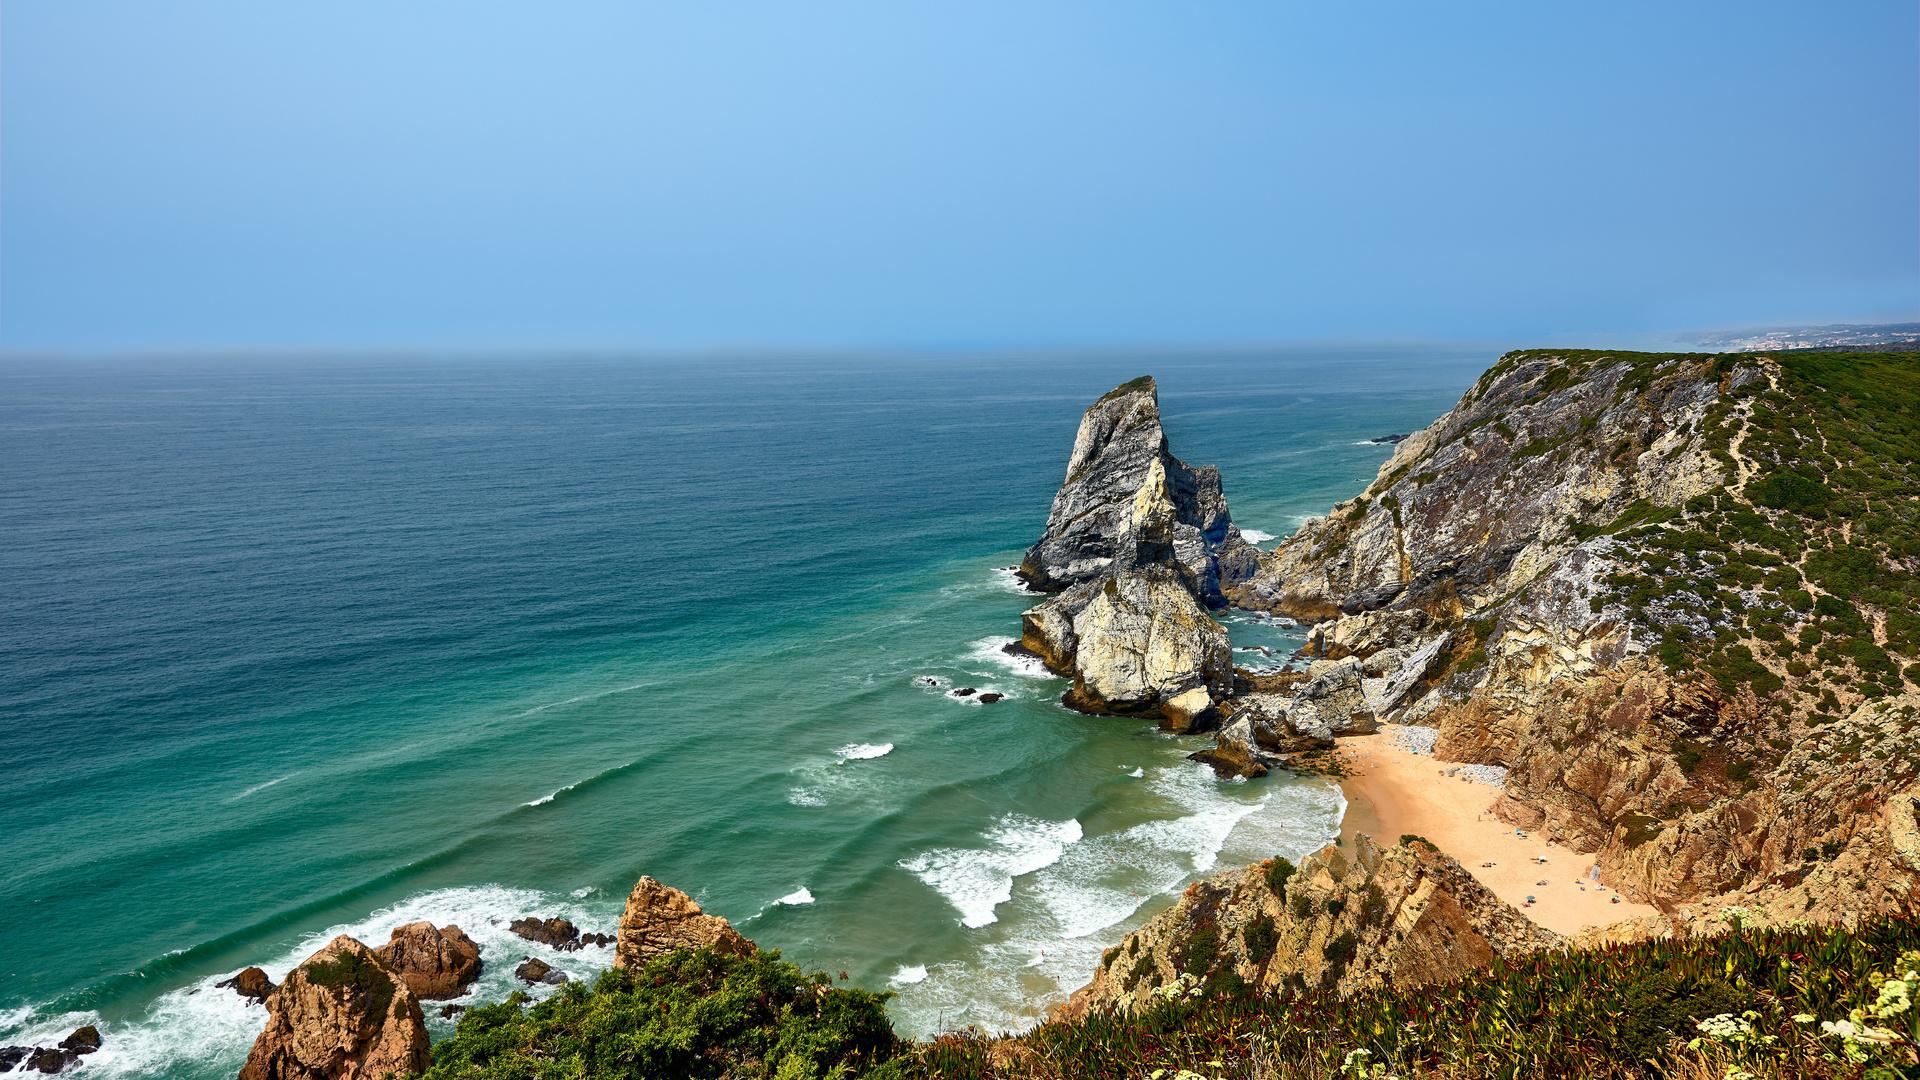 португалия, побережье, океан, cabo da roca, скала, природа